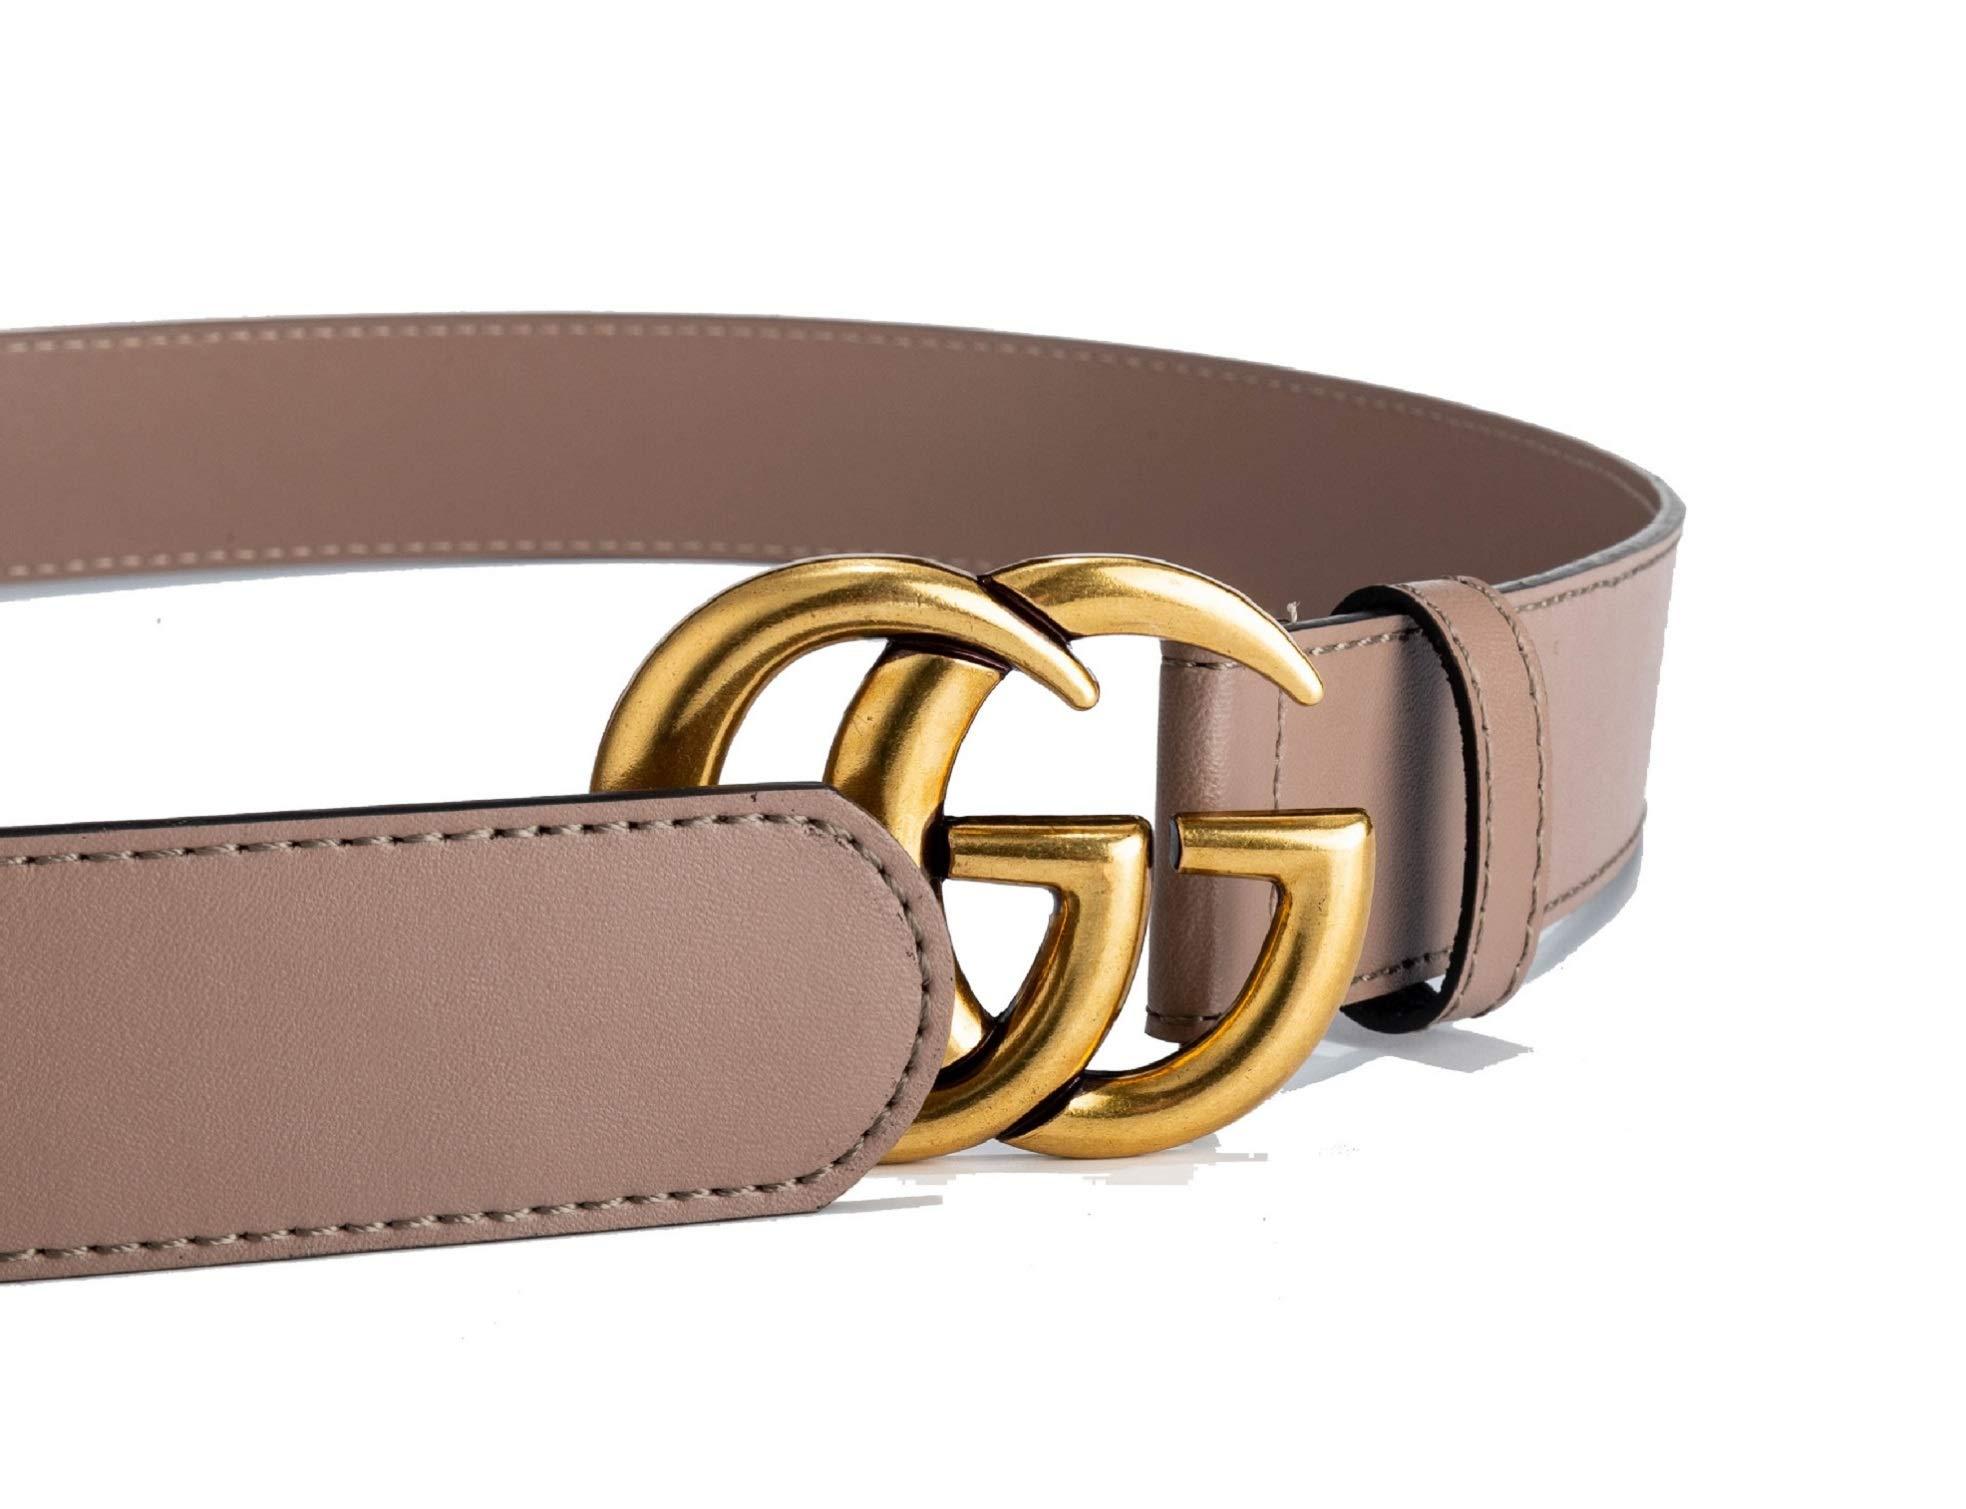 Duobuquhe Luxury Women Coffee Leather GG Belt Fashion Slim Thin Dress Belt for Jeans Vintage Gold Buckle-105cm